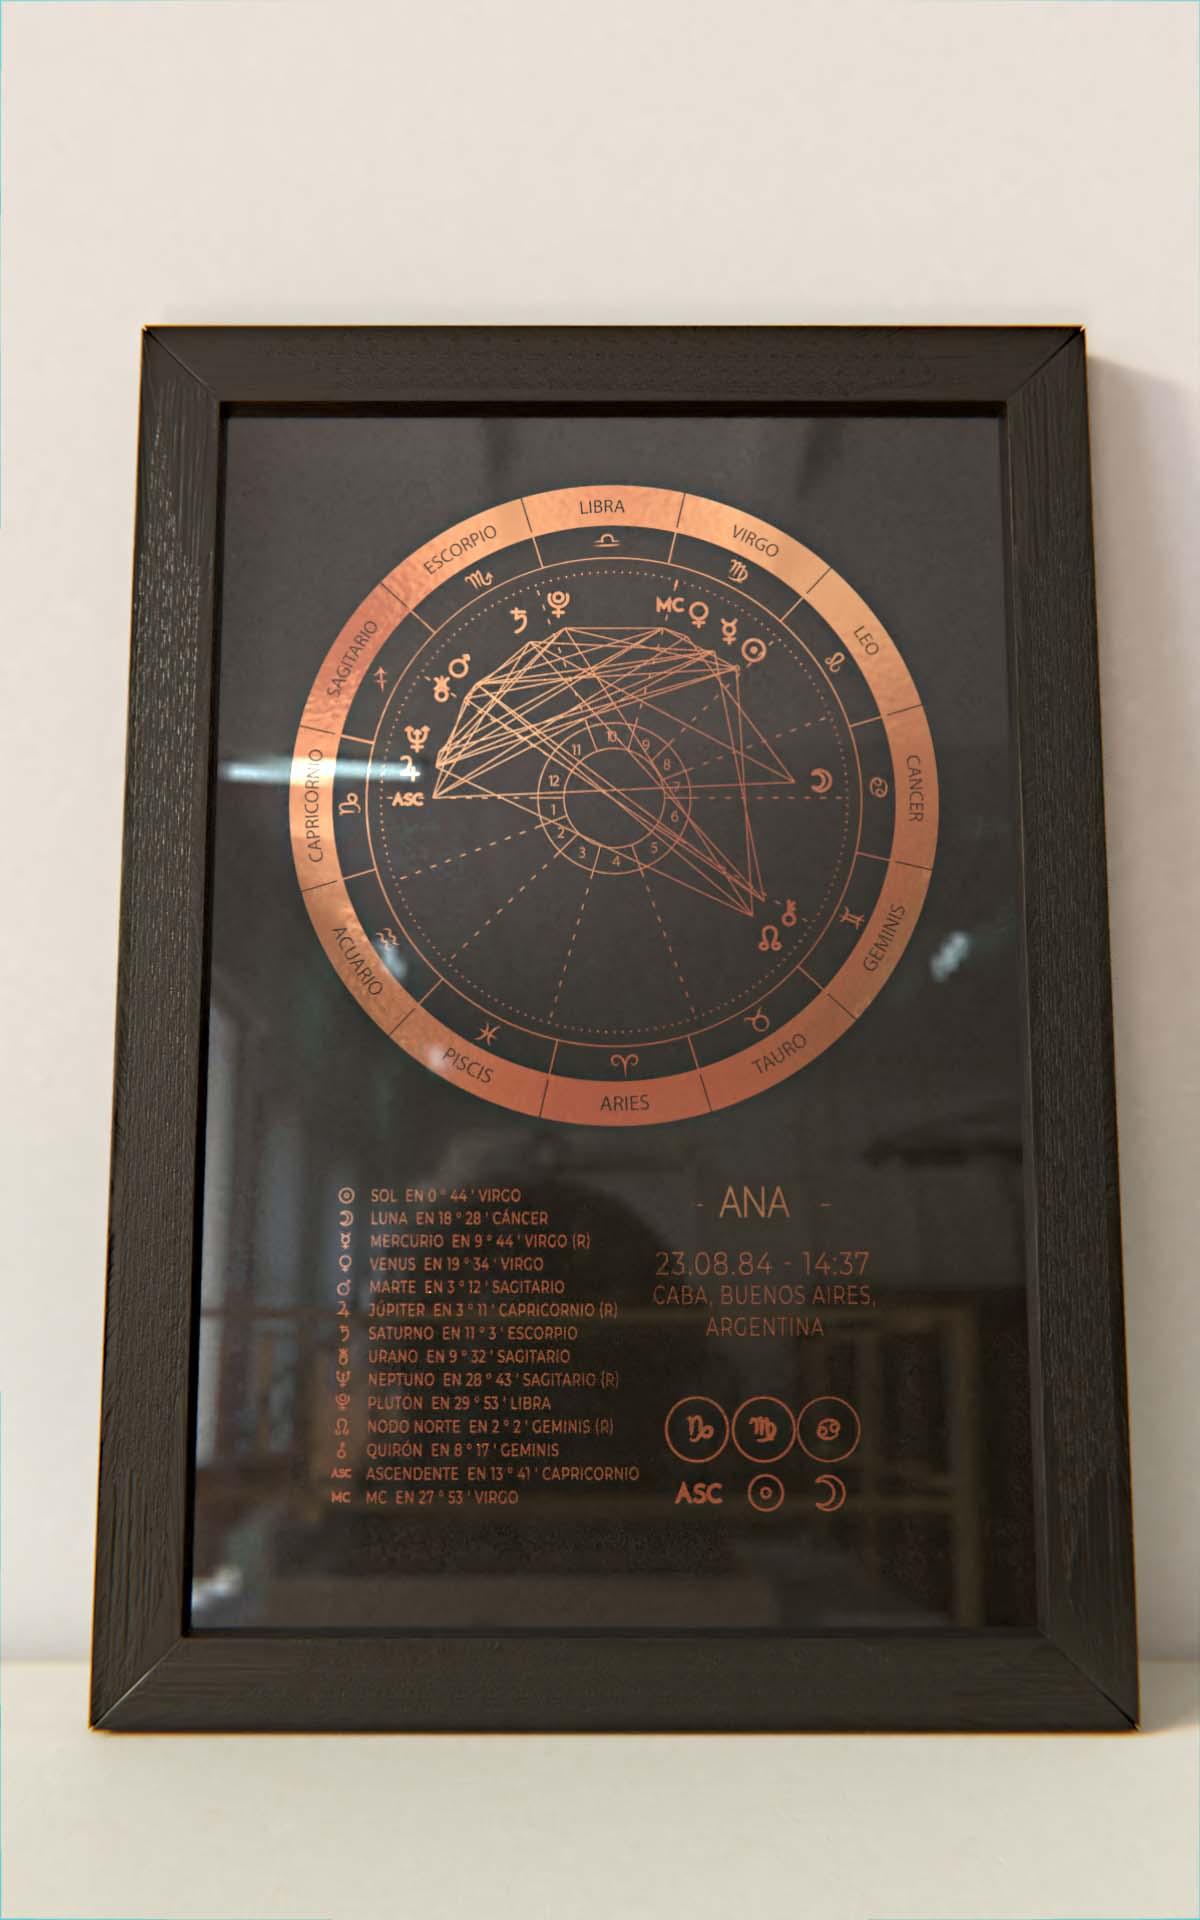 Arte Astral - Carta Astral Detallada Cobre marco negro Hoja Negra